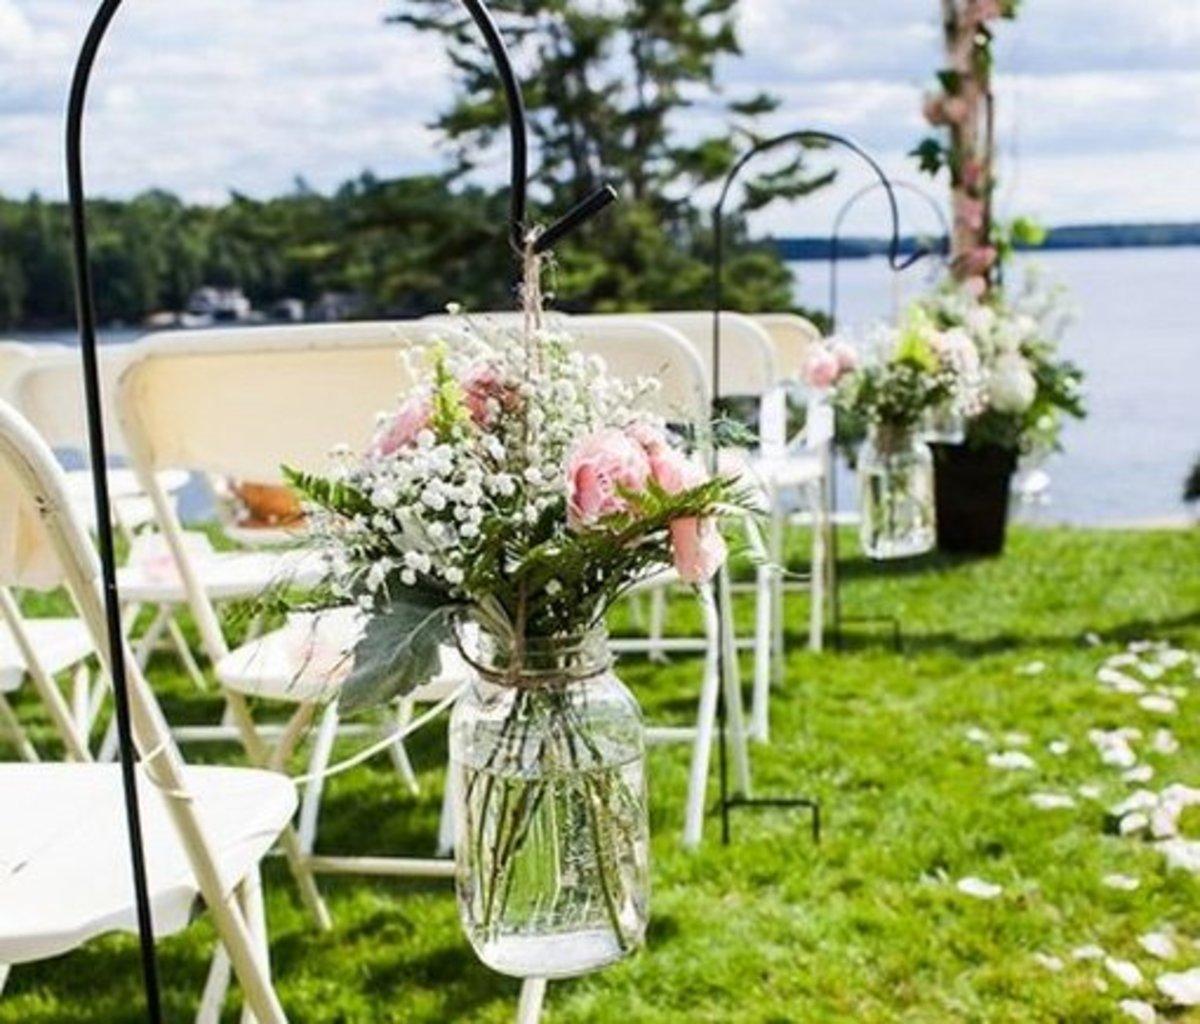 DIY Wedding Table Decoration Ideas   Mason Jar Floral Decorations   Click Pic for 20 Easy DIY Wedding Decorations